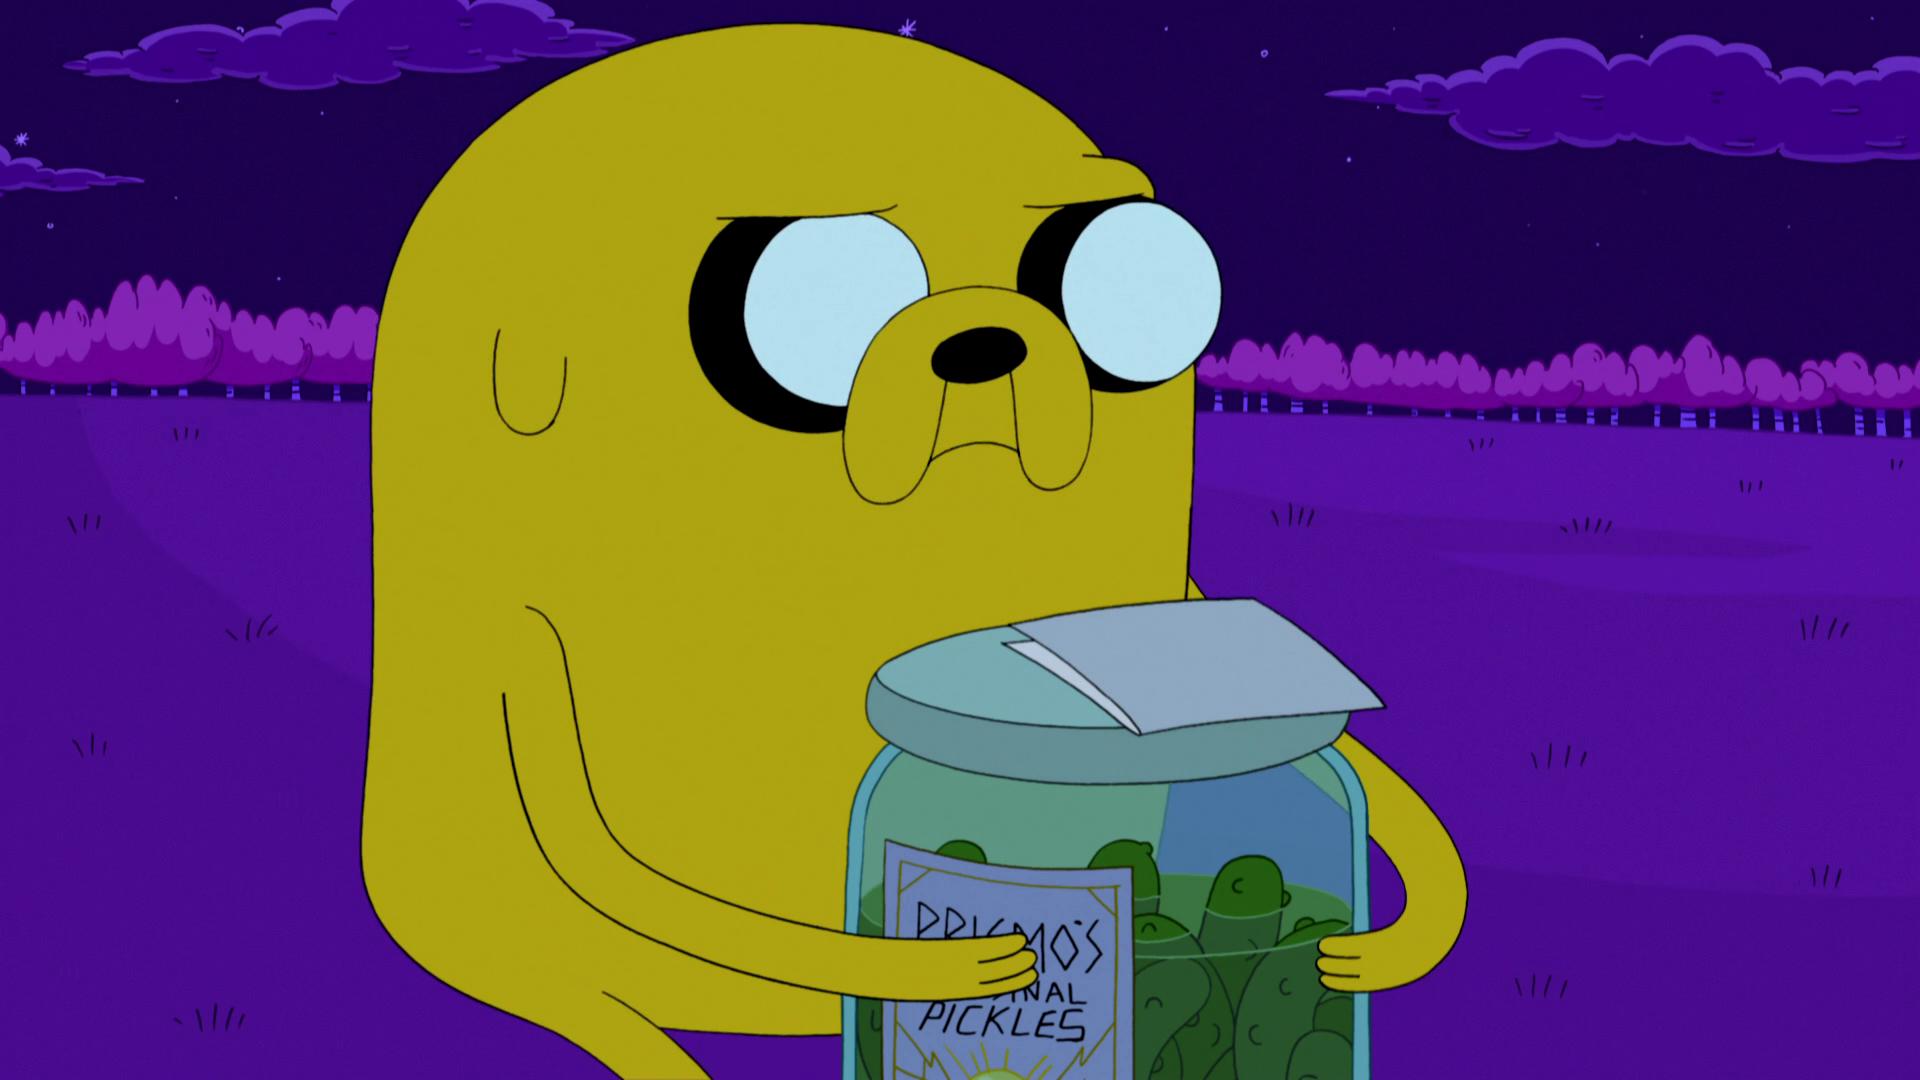 Prismo\'s Homemade Artisanal Pickles | Adventure Time Wiki | FANDOM ...